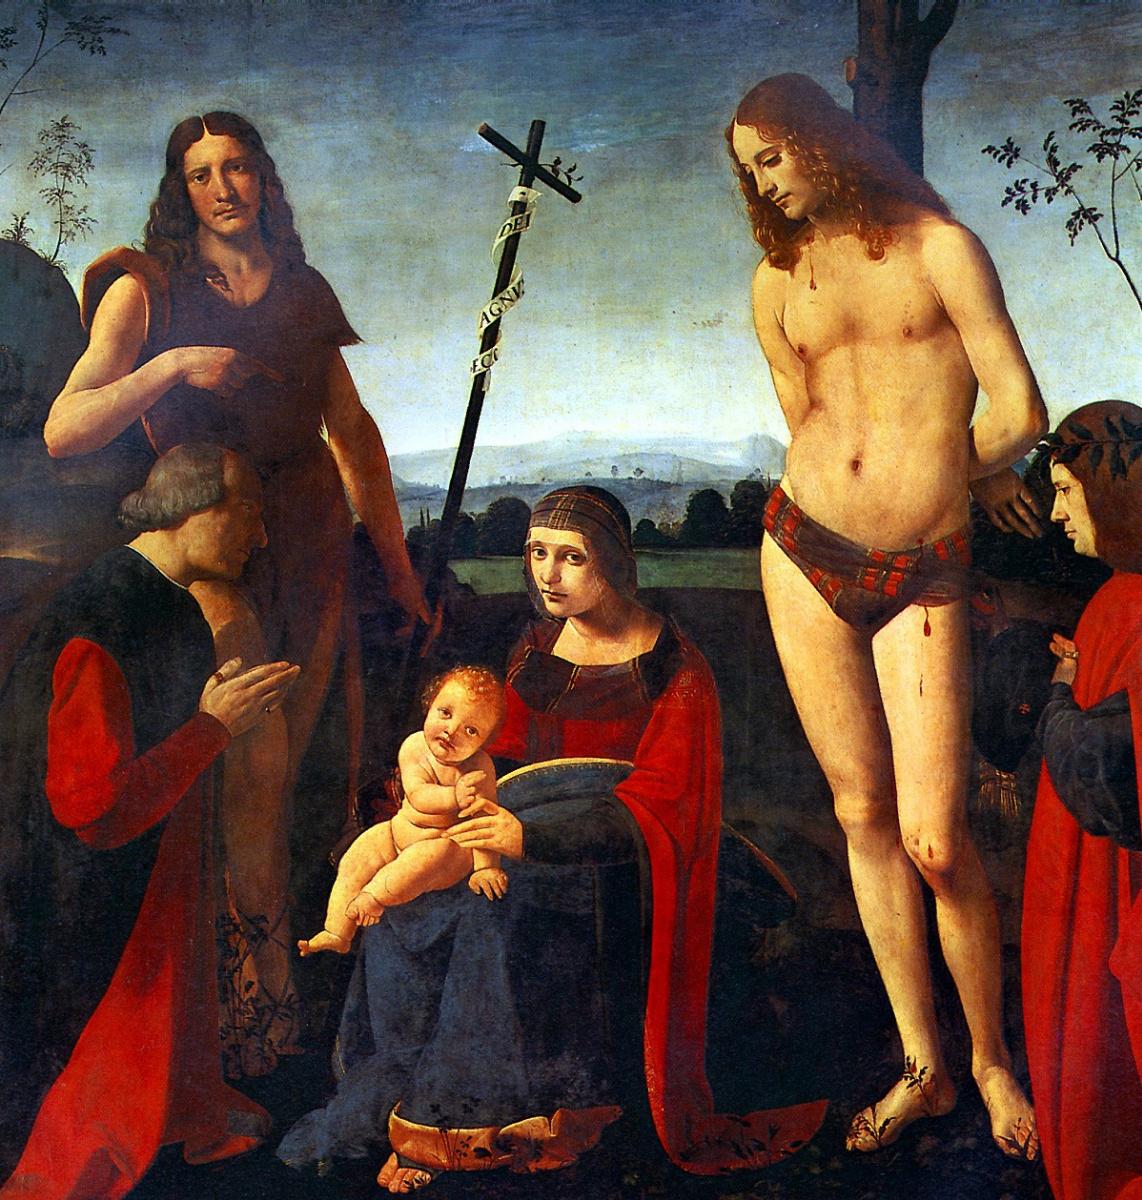 Giovanni Antonio Boltraffio. Madonna and child with saints John the Baptist and Sebastian